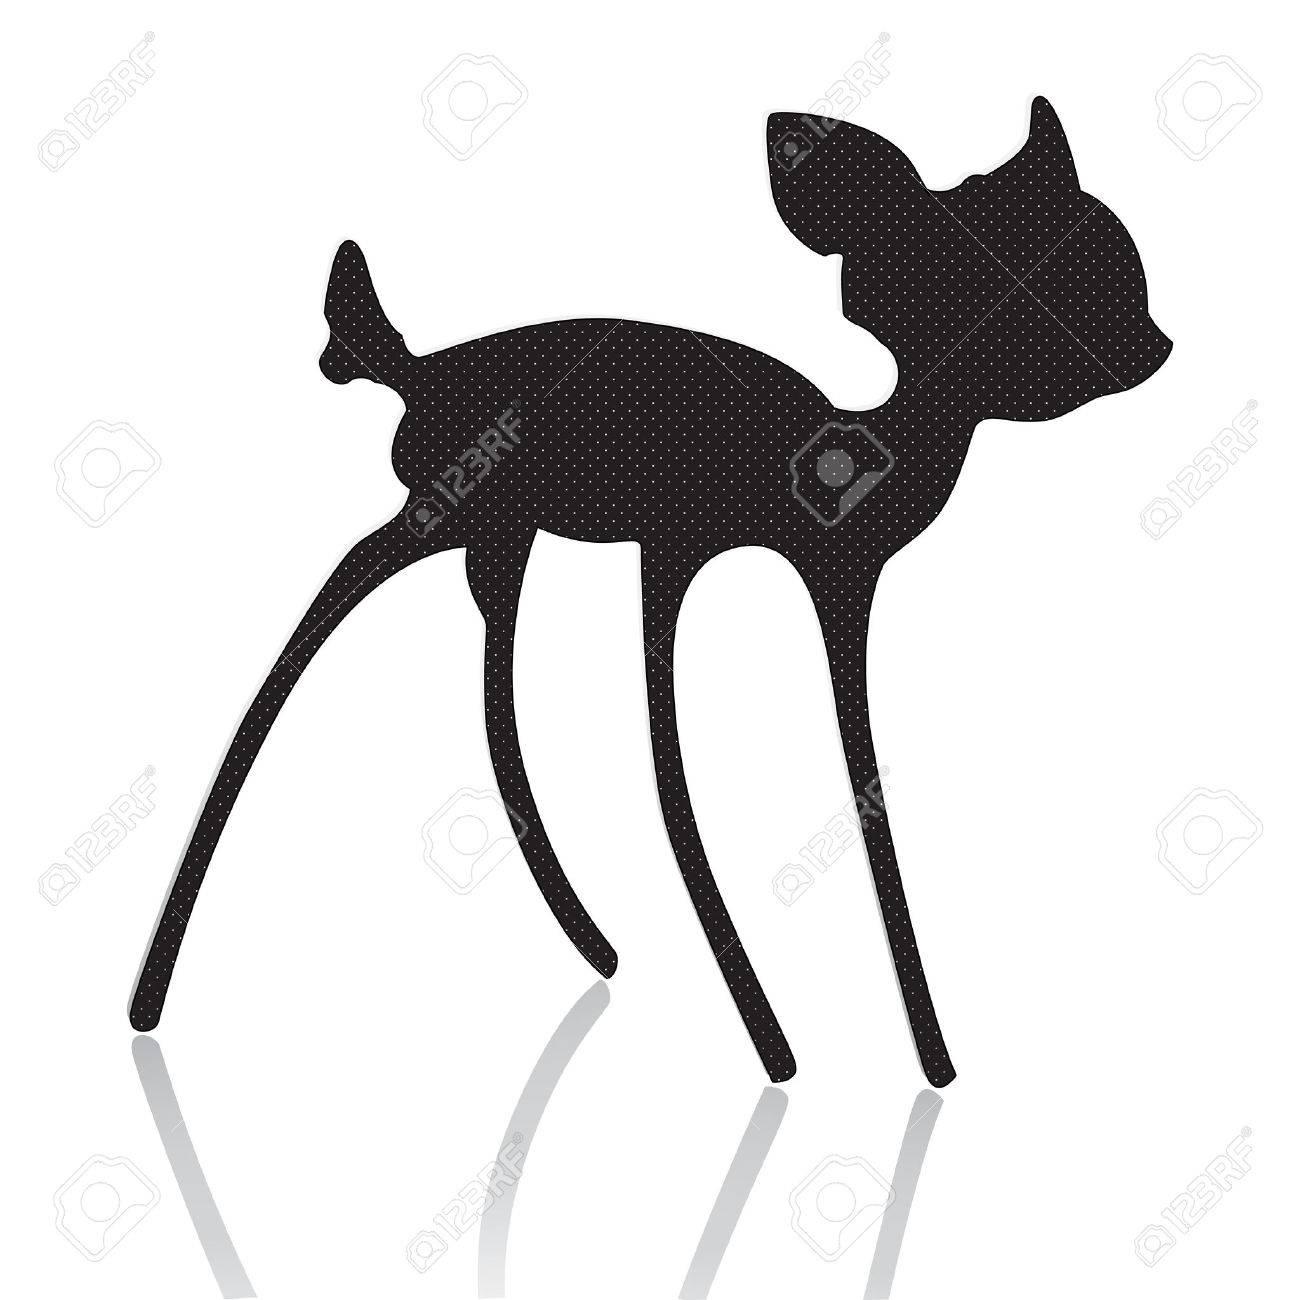 bambi silhouette vector illustration Stock Vector - 4792218